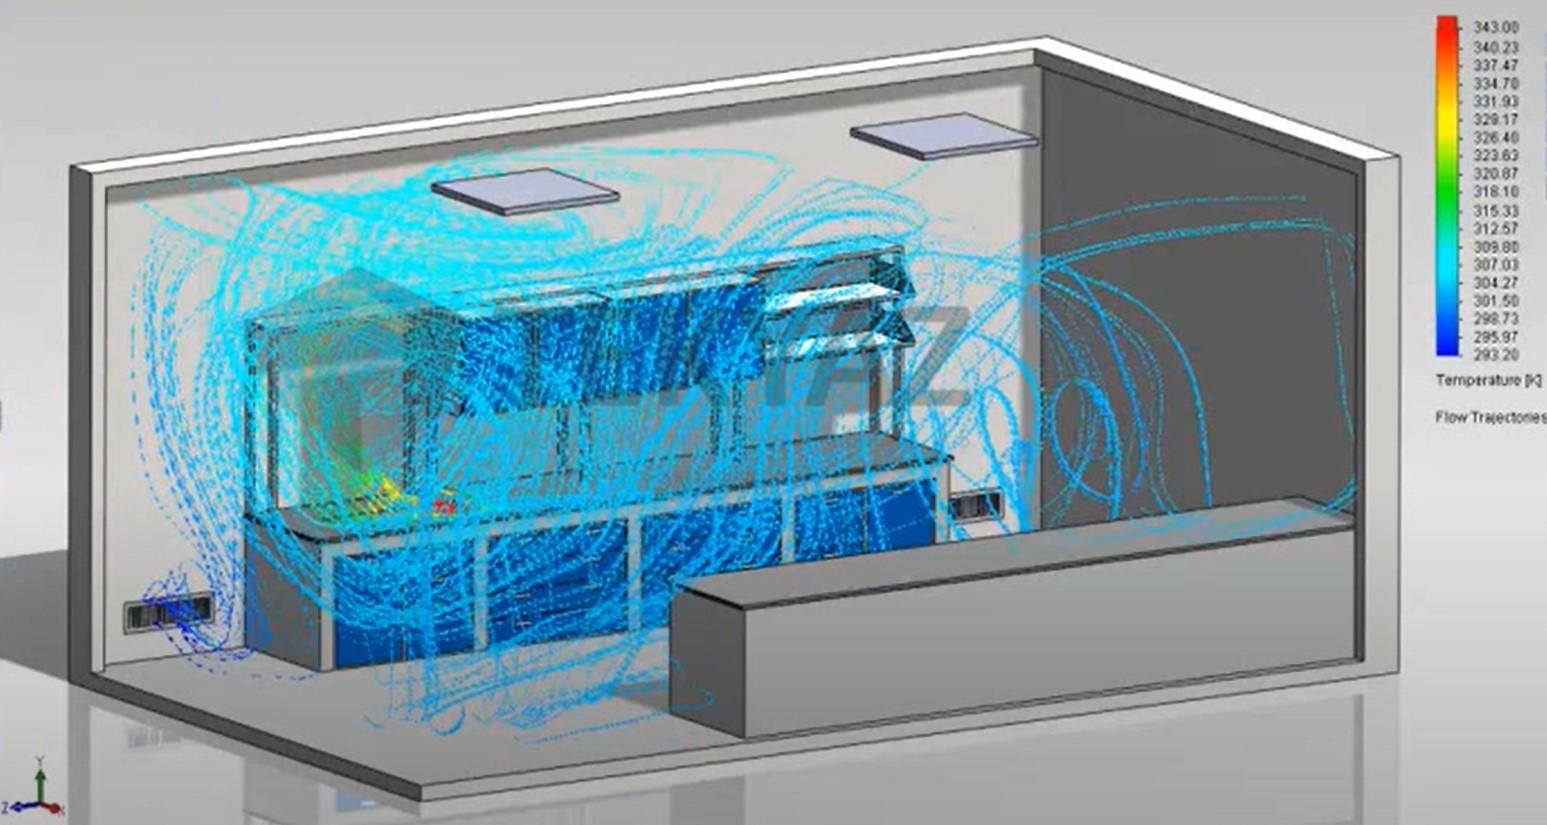 HVAC Tracer Study